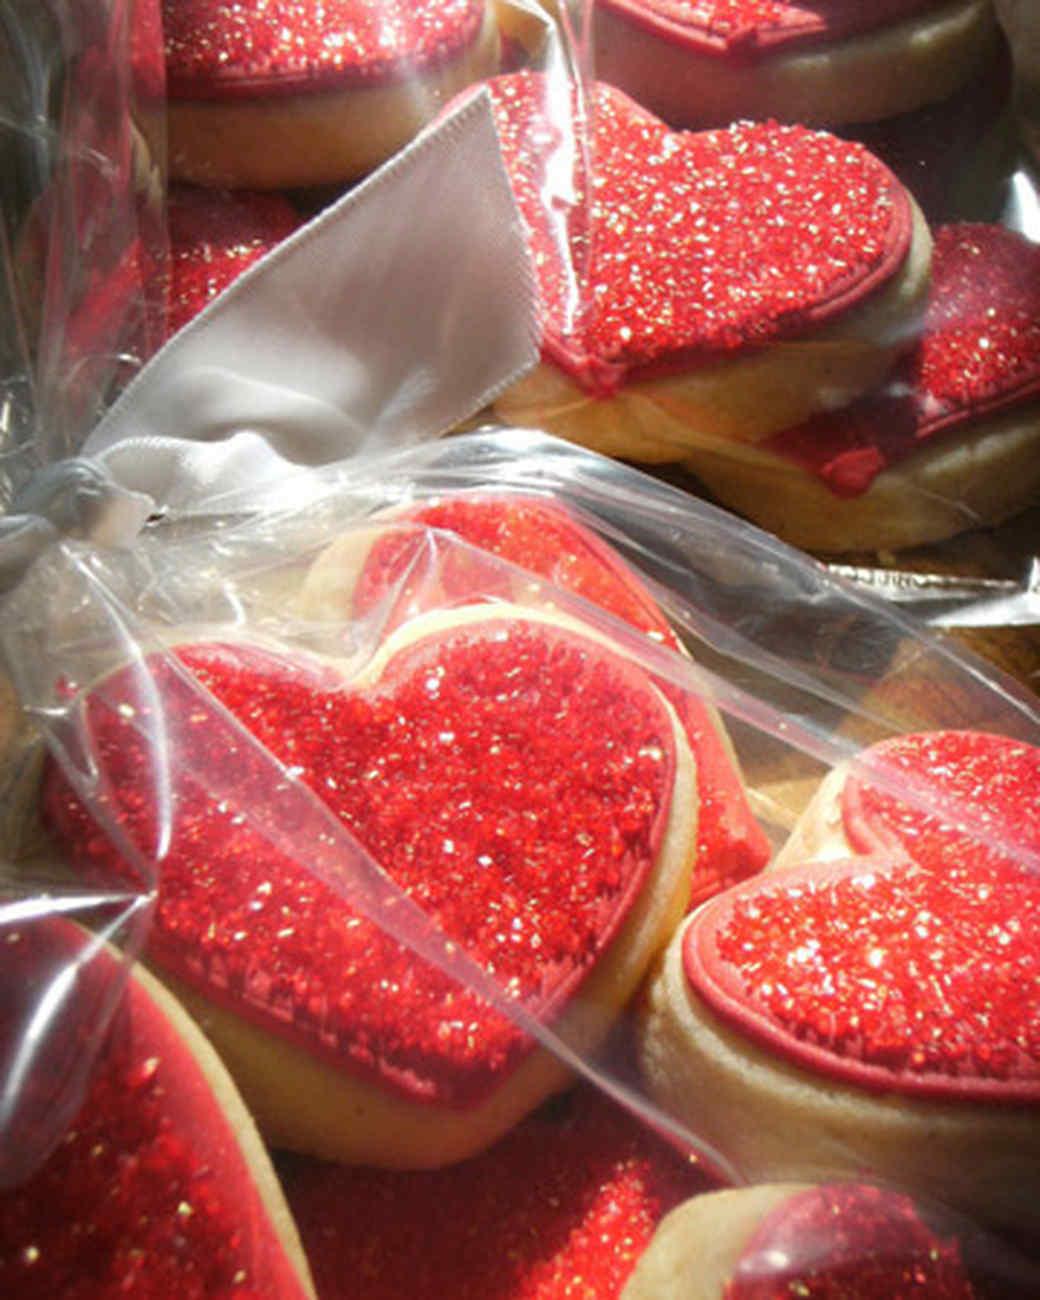 vday_treat_ugc09_sparkly_heart_cookies.jpg